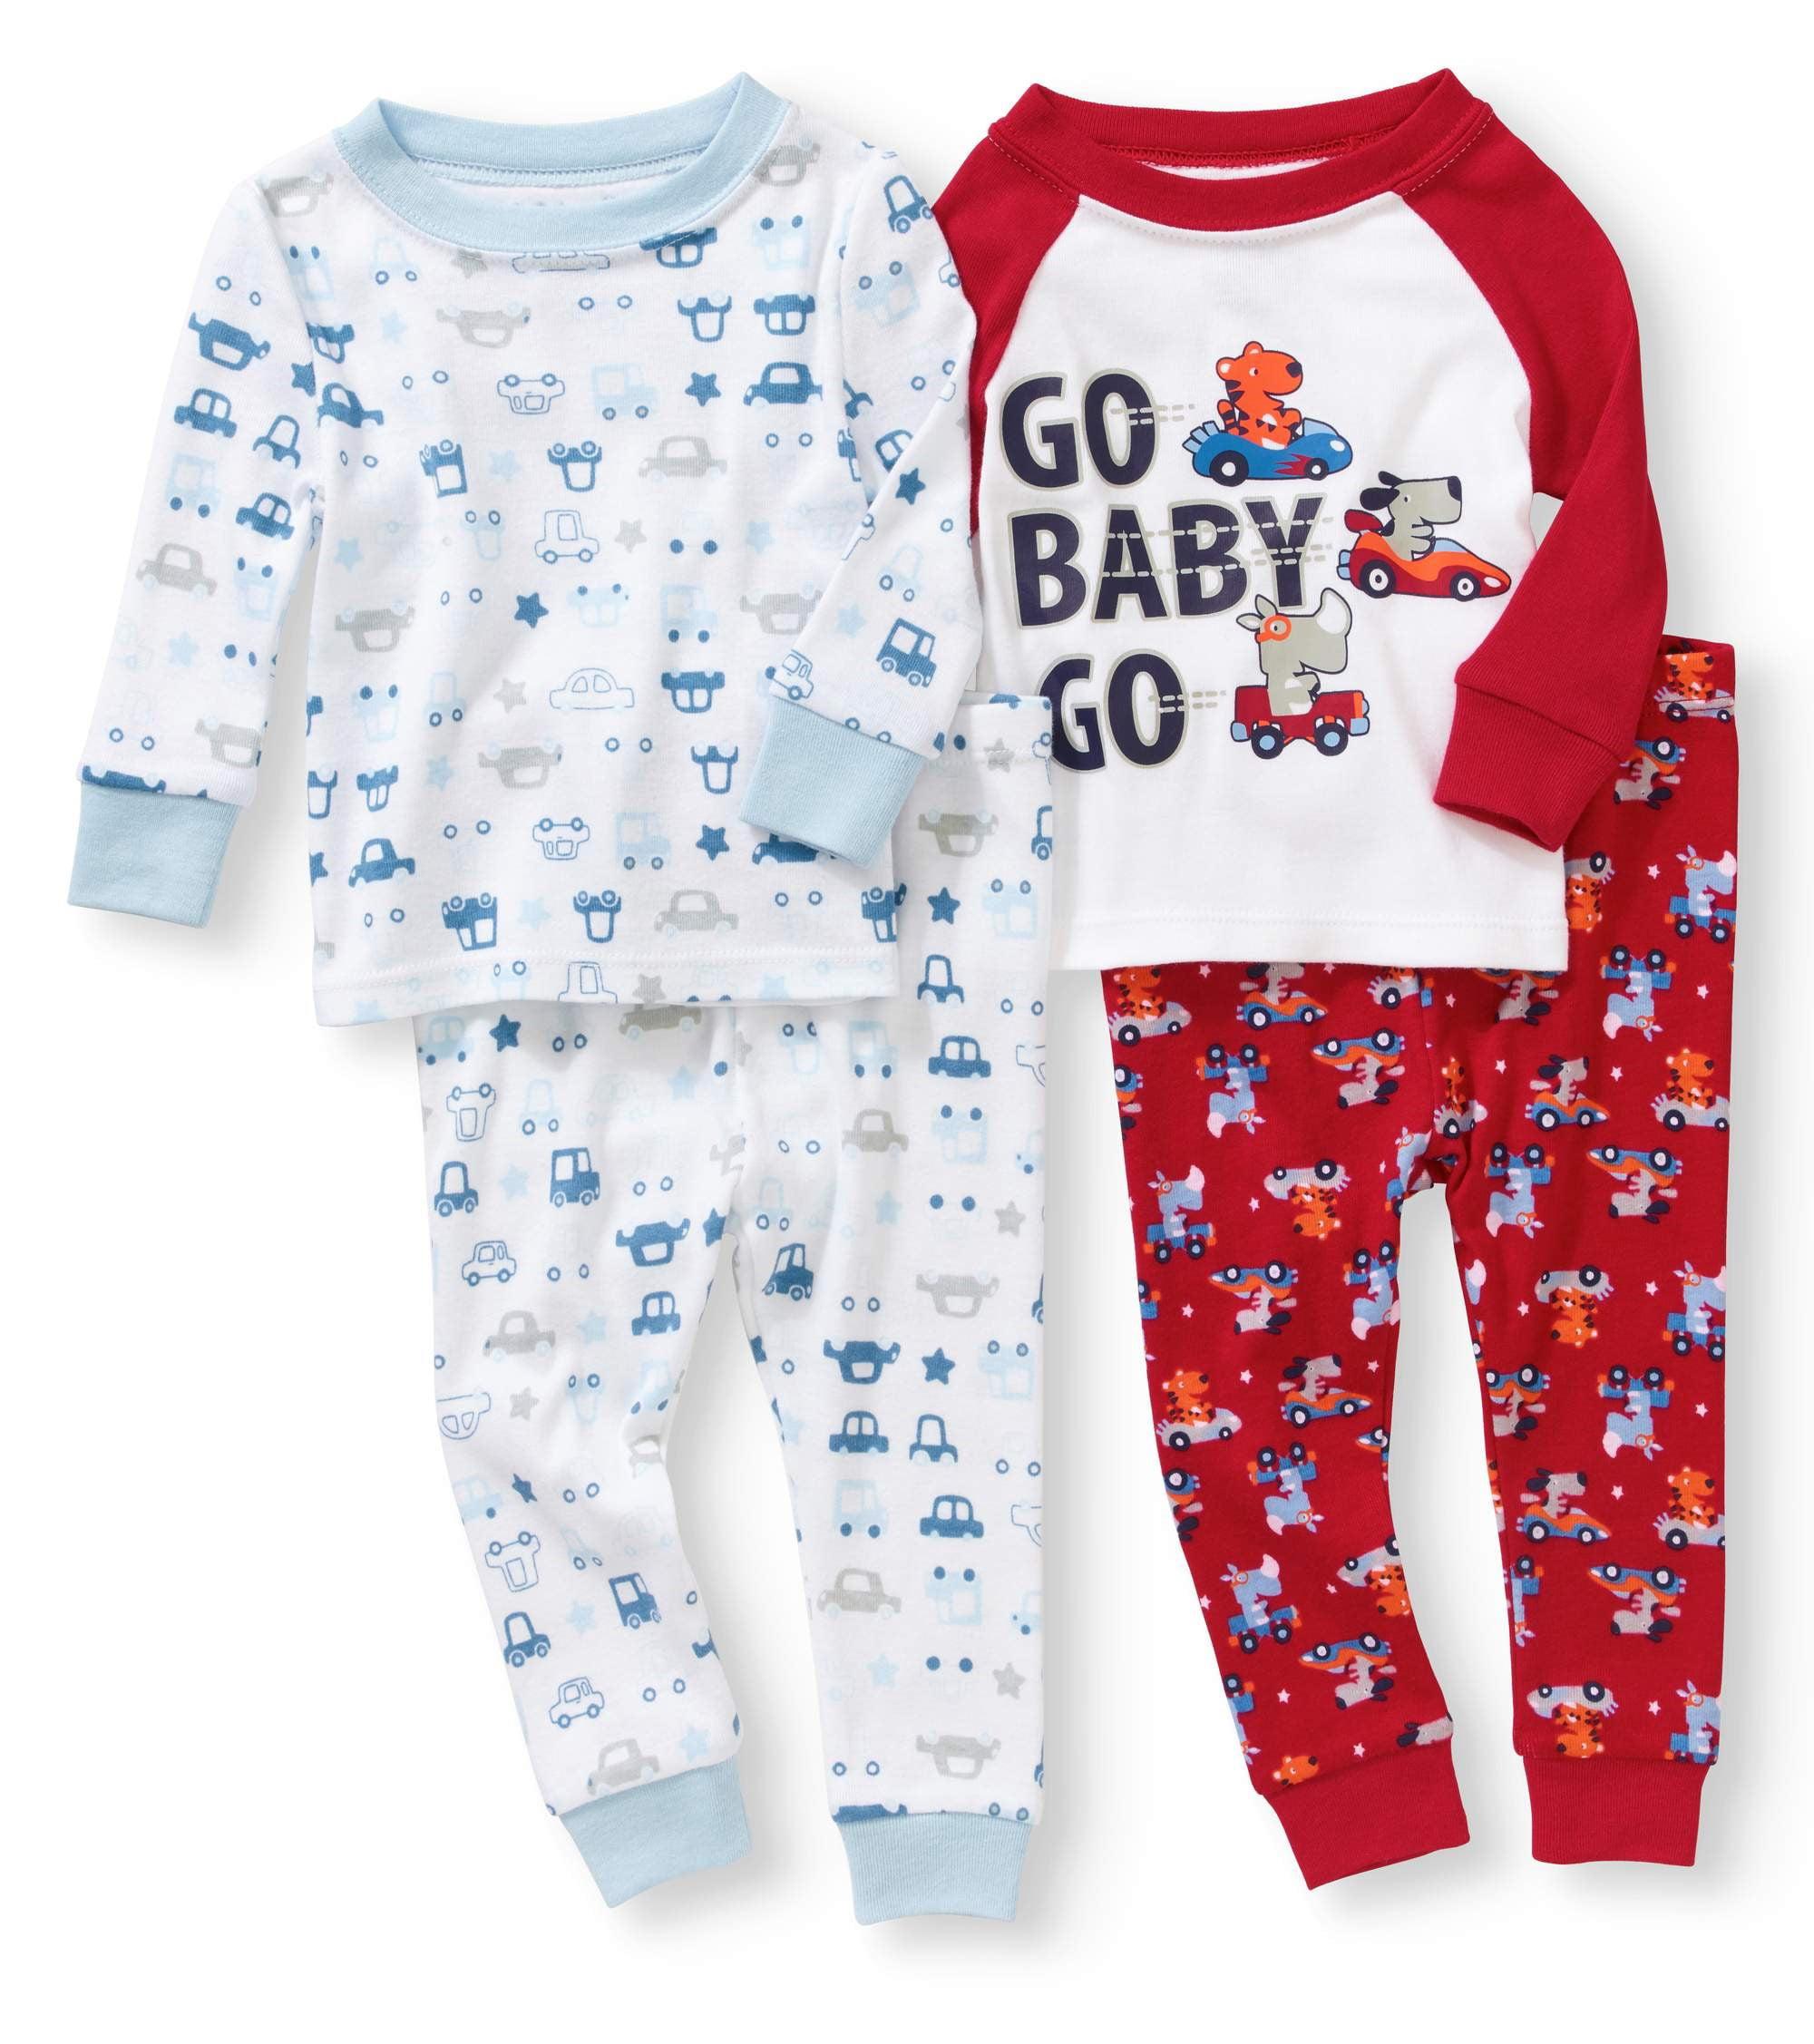 Baby Toddler Boy Tight Fit Cotton Pajama 4pc Set - Walmart.com